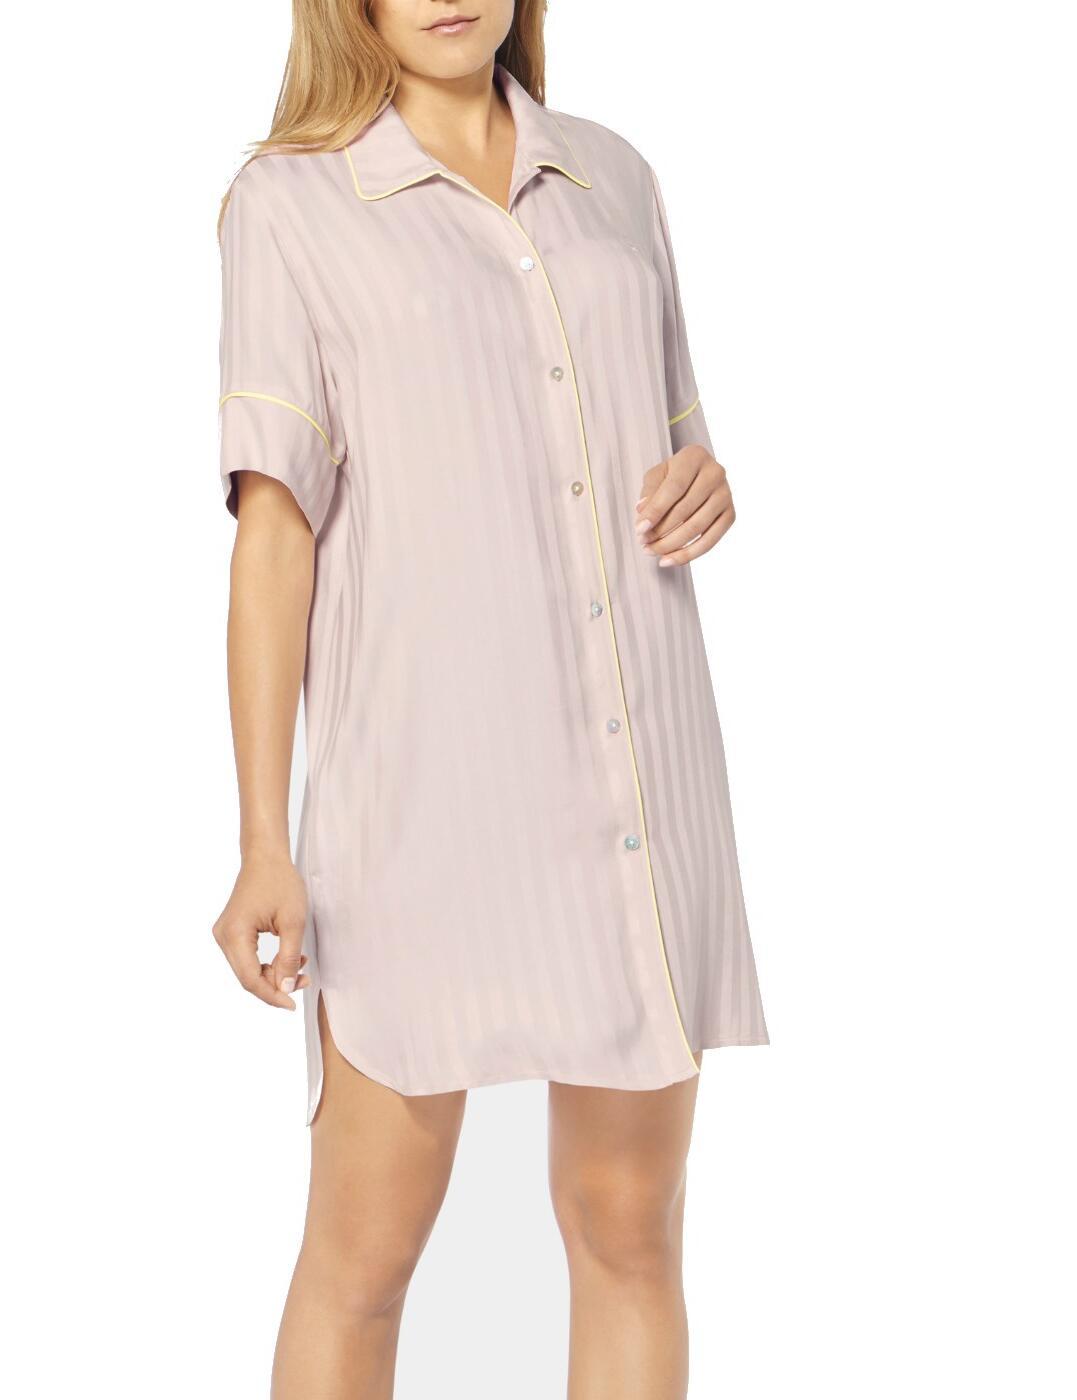 10194640 Triumph Nightdresses NDW Boyfriend - 10194640 Brushed Pink